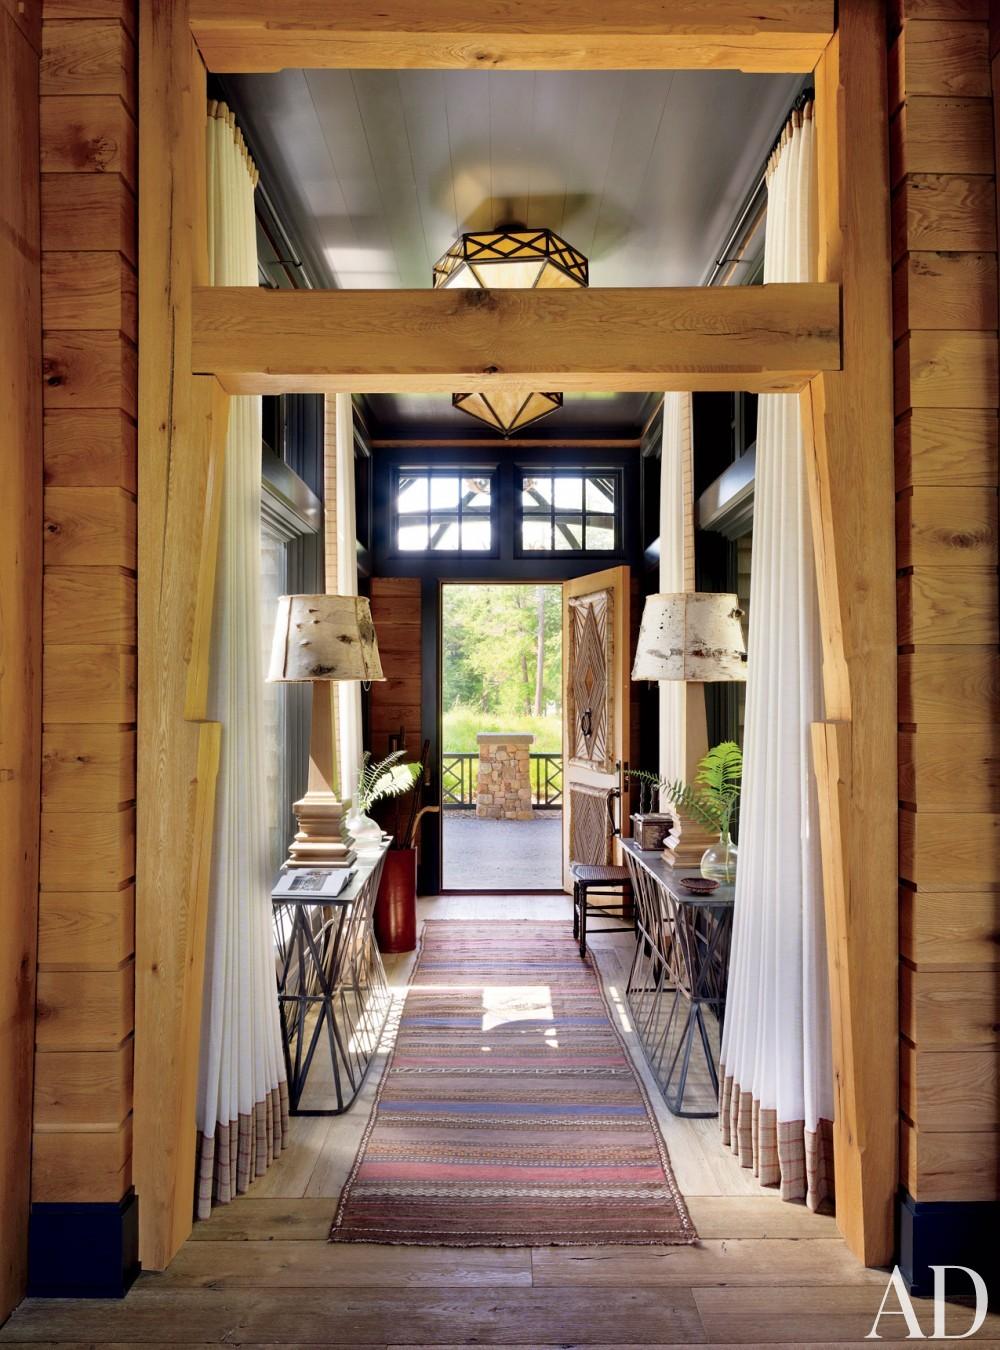 Rustic Entry by Thom Filicia and Shope Reno Wharton in Upper Saranac Lake, NY